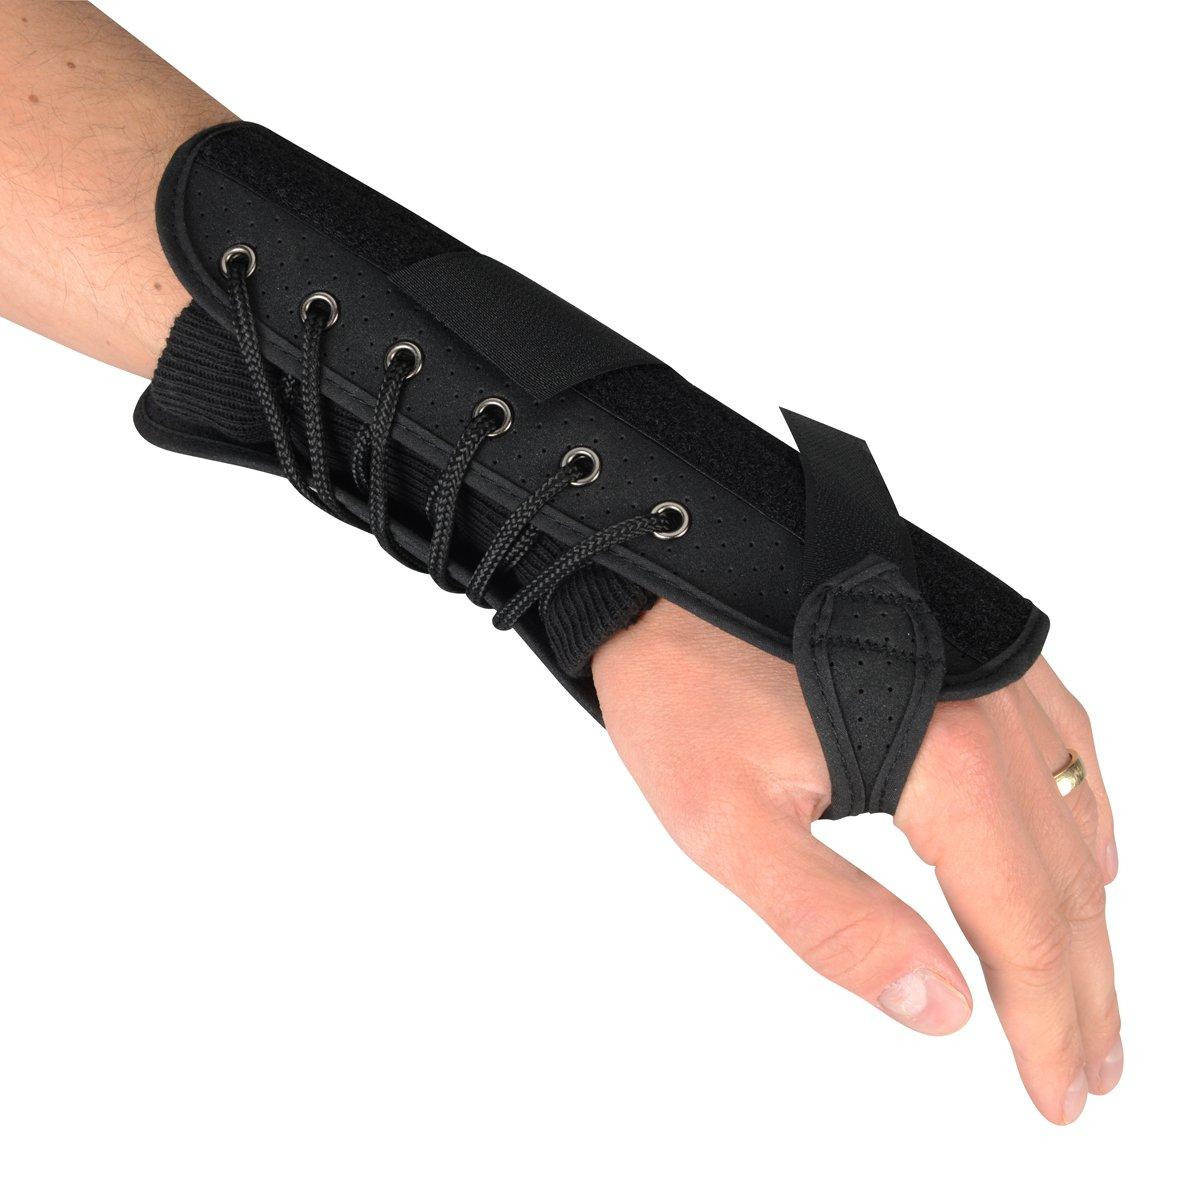 Luxury Quick Lace 7'' Compression Splint Support Wrist Brace - Right Hand - XL